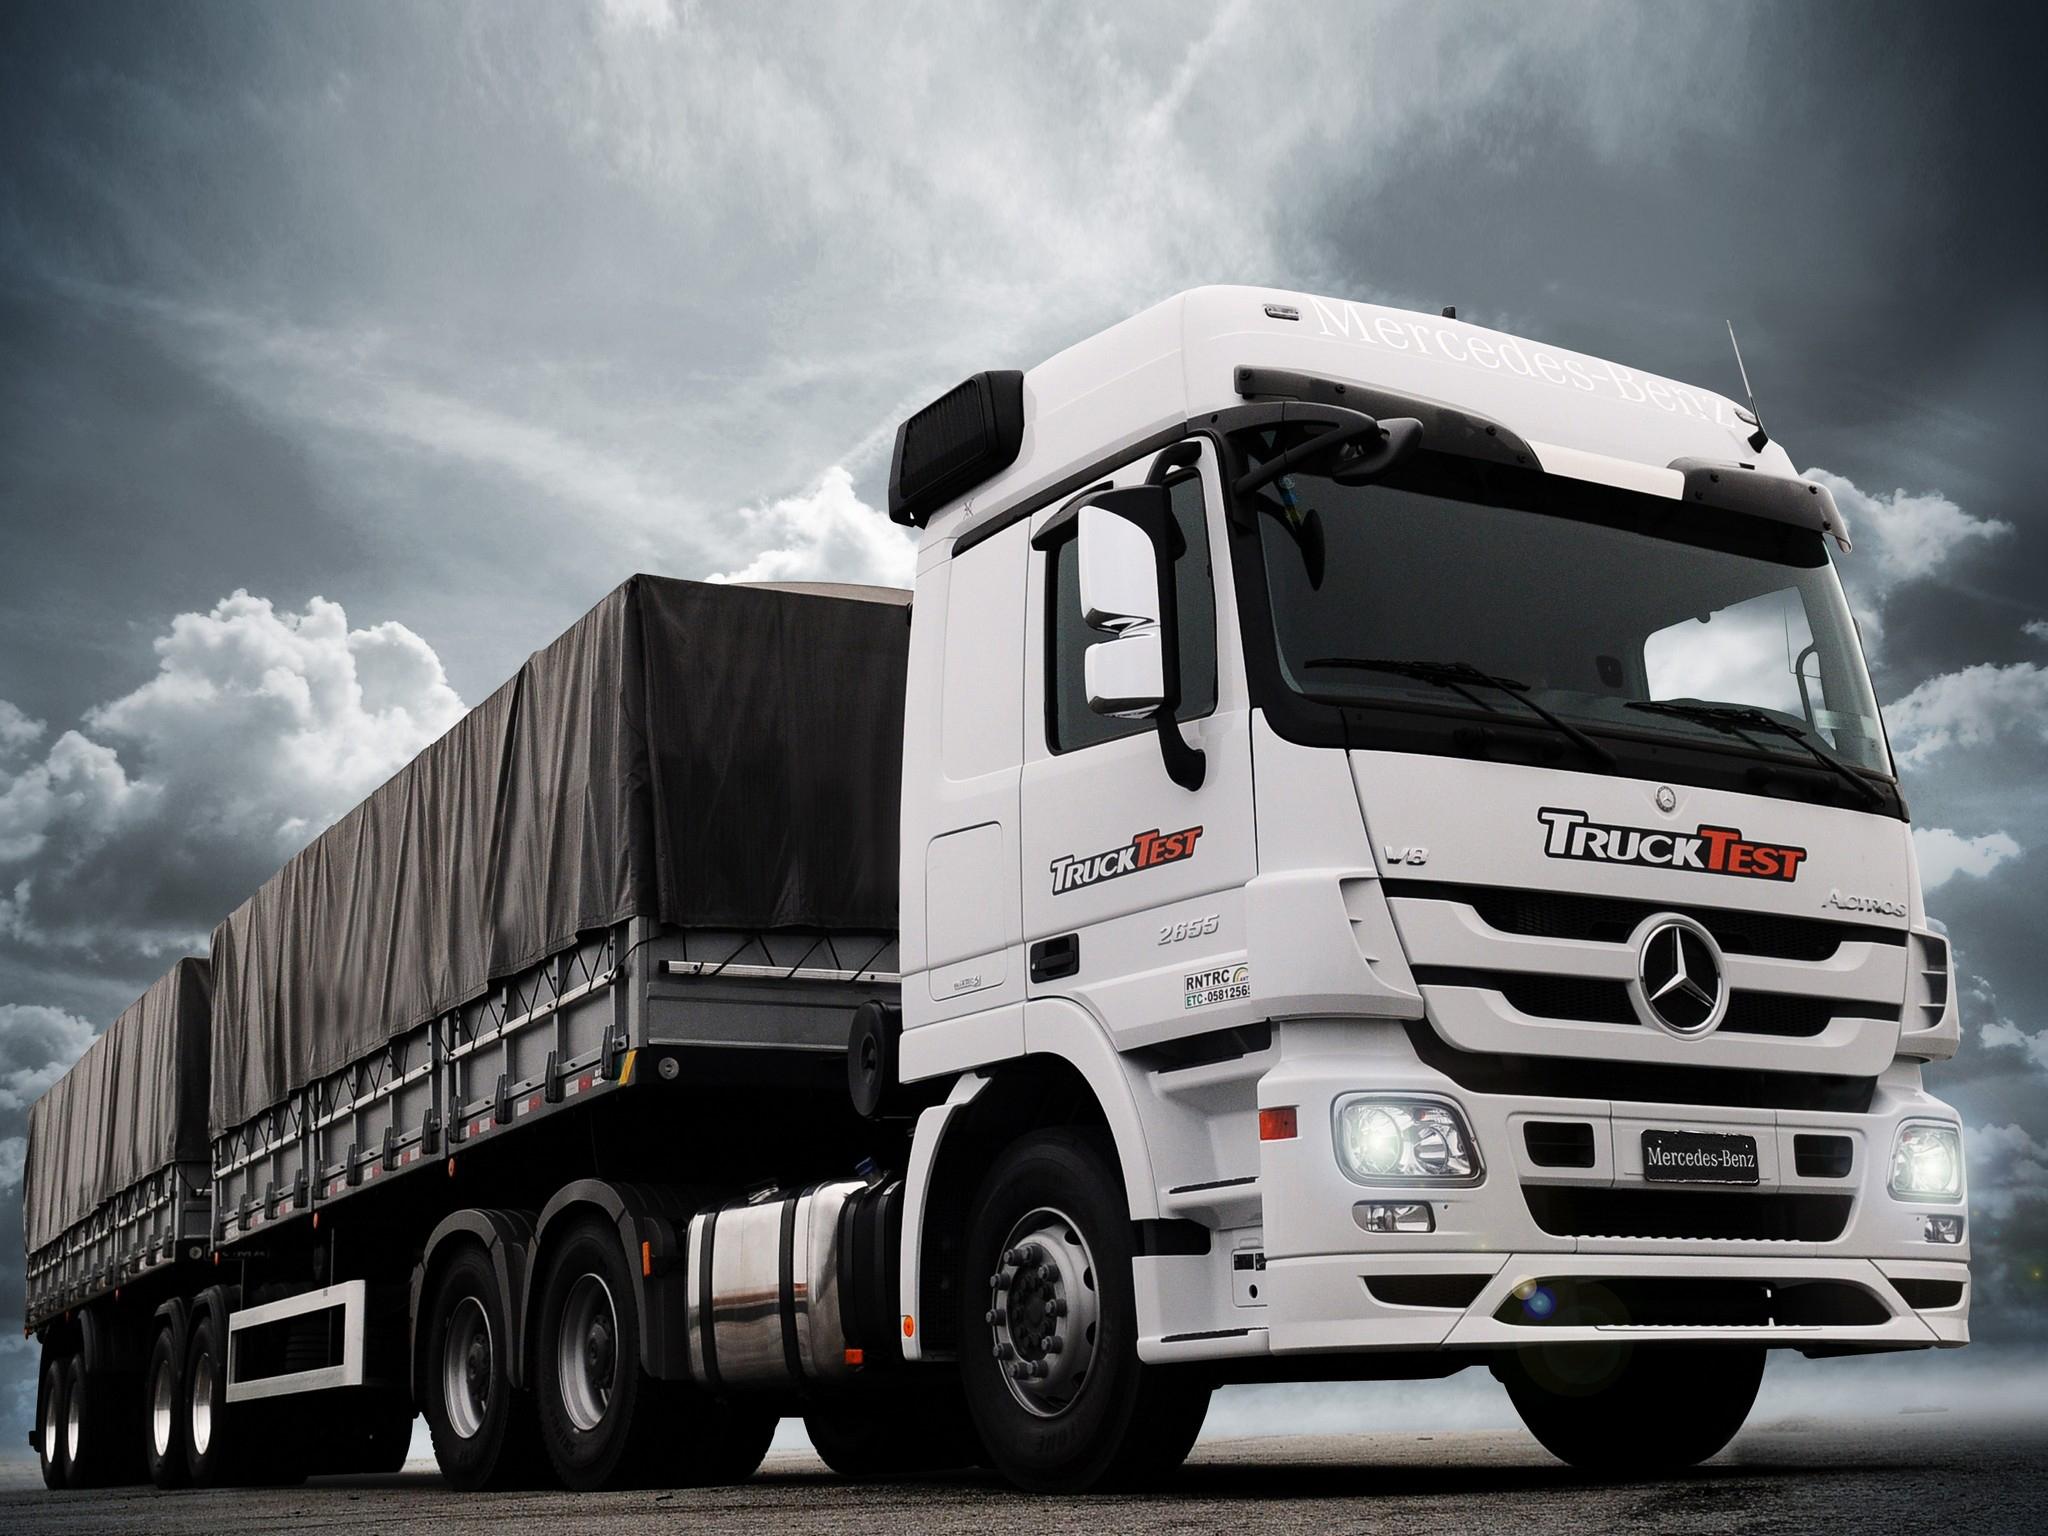 2013 mercedes benz actros 2655 br spec mp3 semi tractor. Black Bedroom Furniture Sets. Home Design Ideas